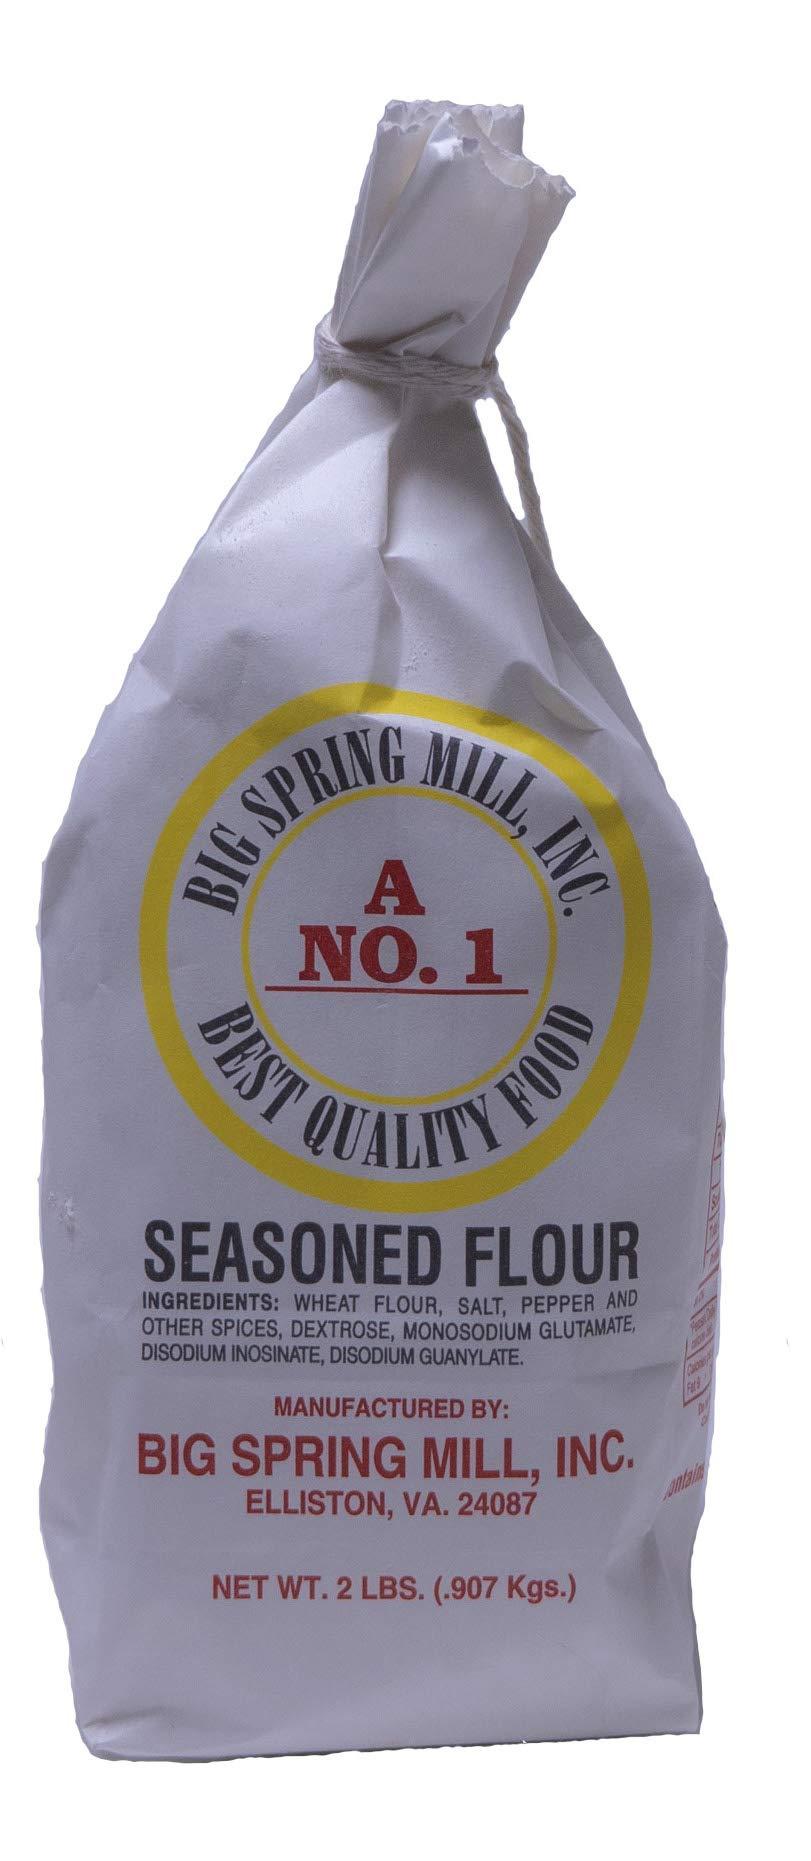 Big Spring Mill A-No.-1 Seasoned Flour